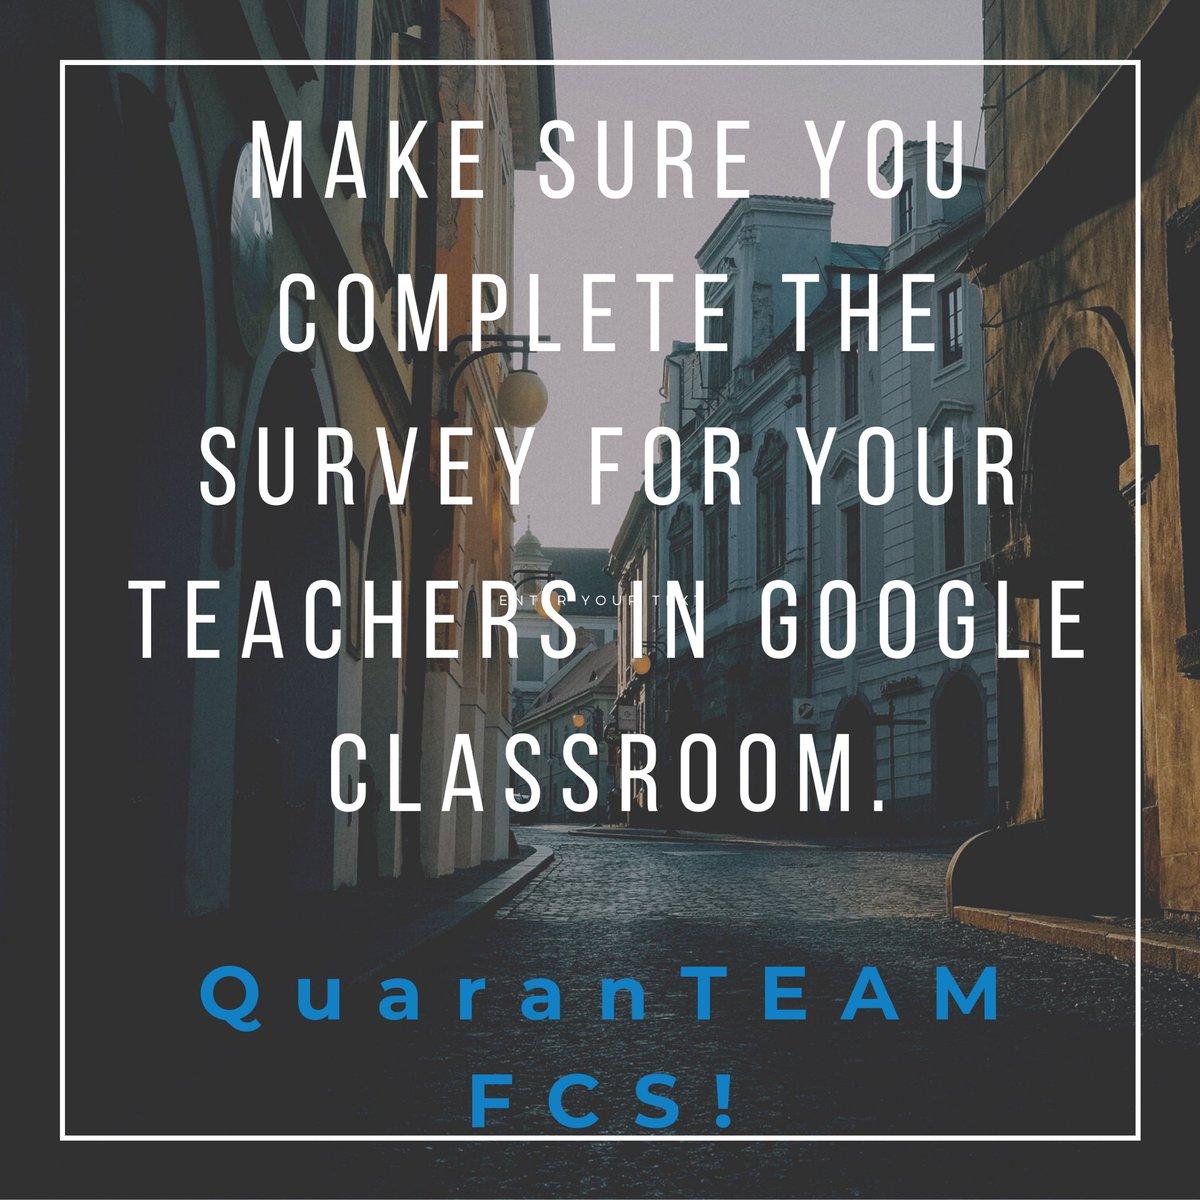 CSHS, your teachers need your help!